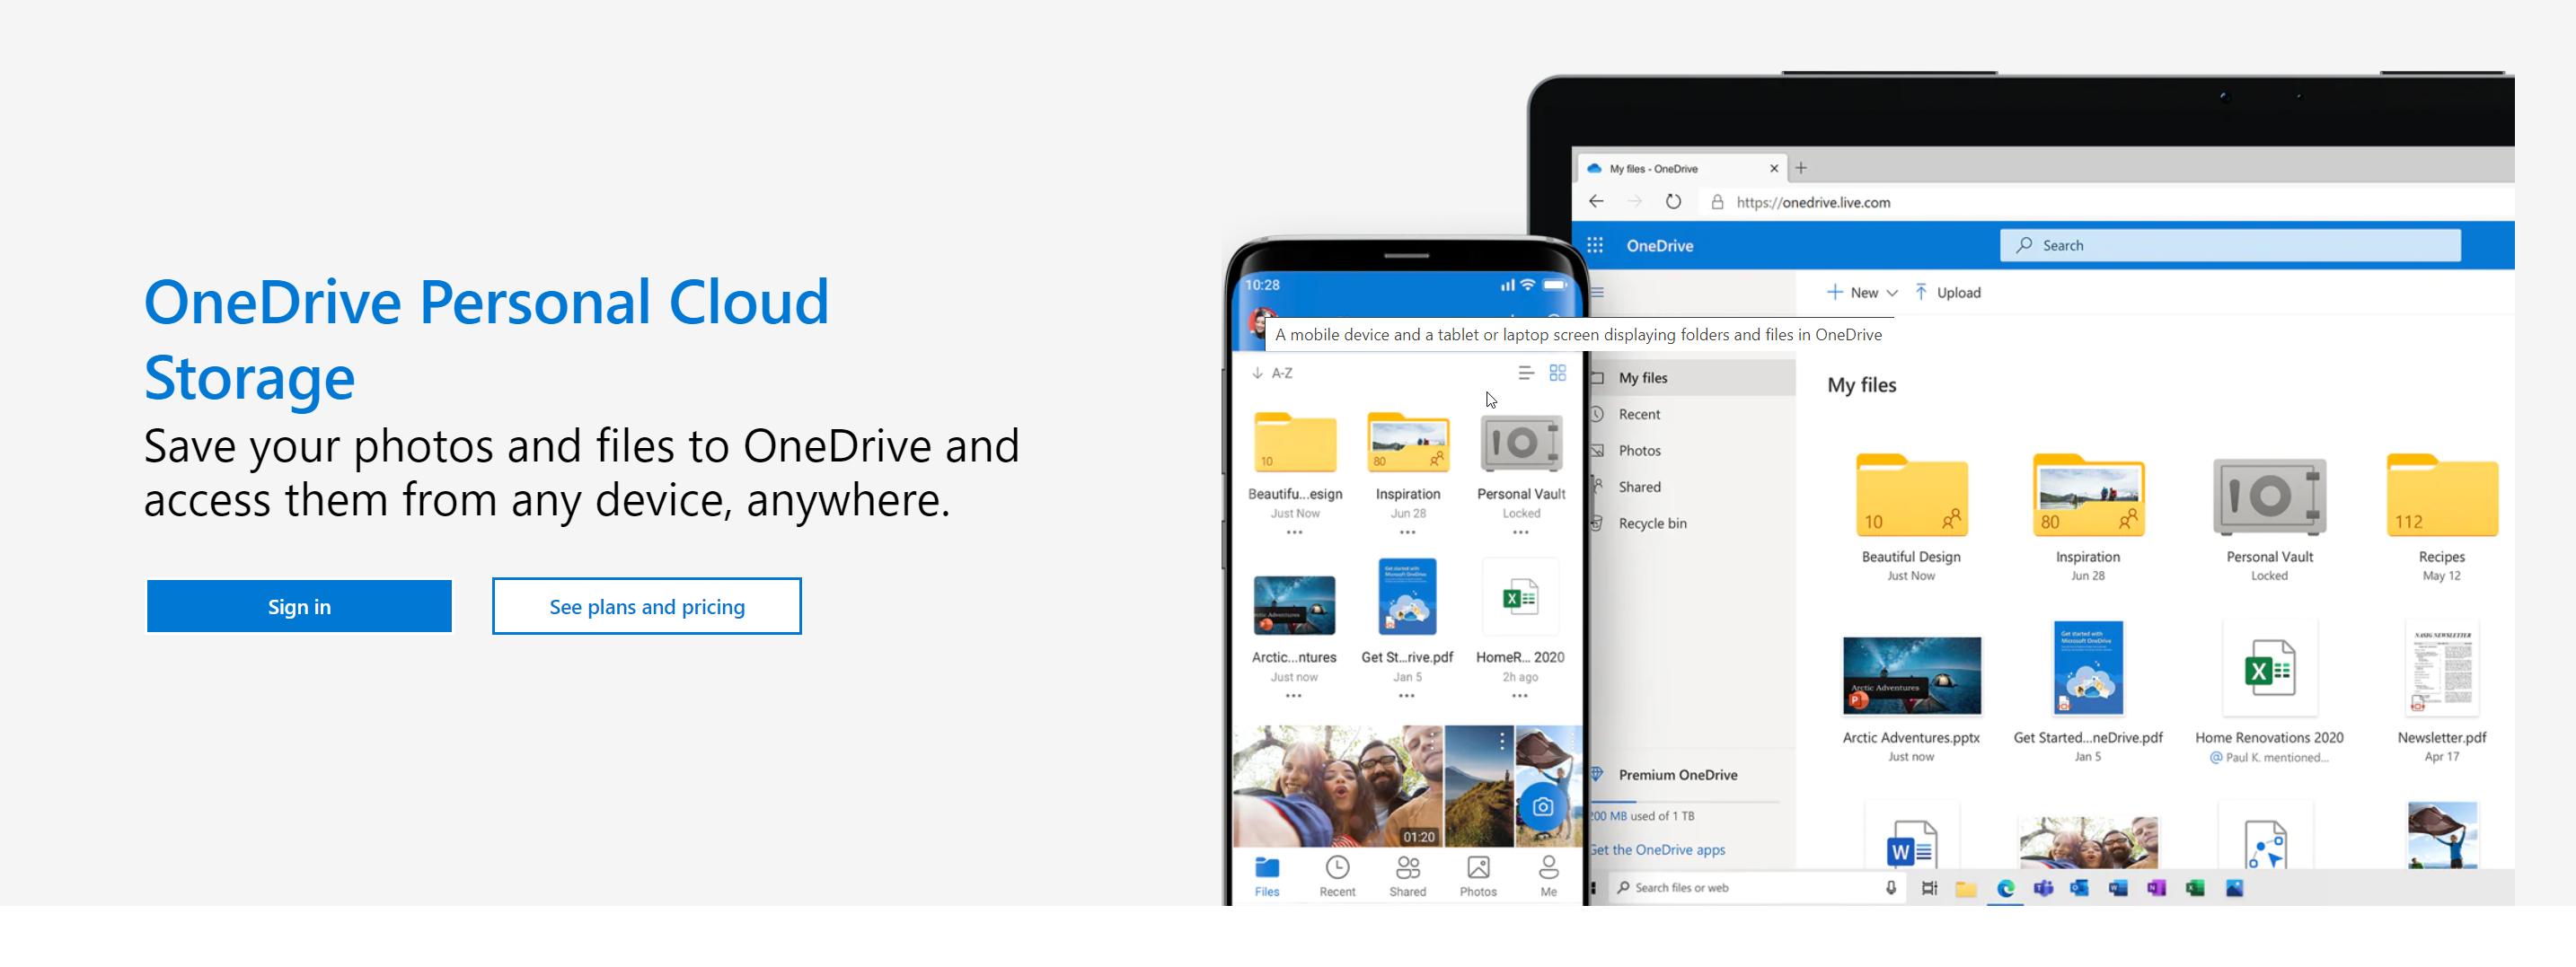 OneDrive - Basic Video Cloud Storage Option